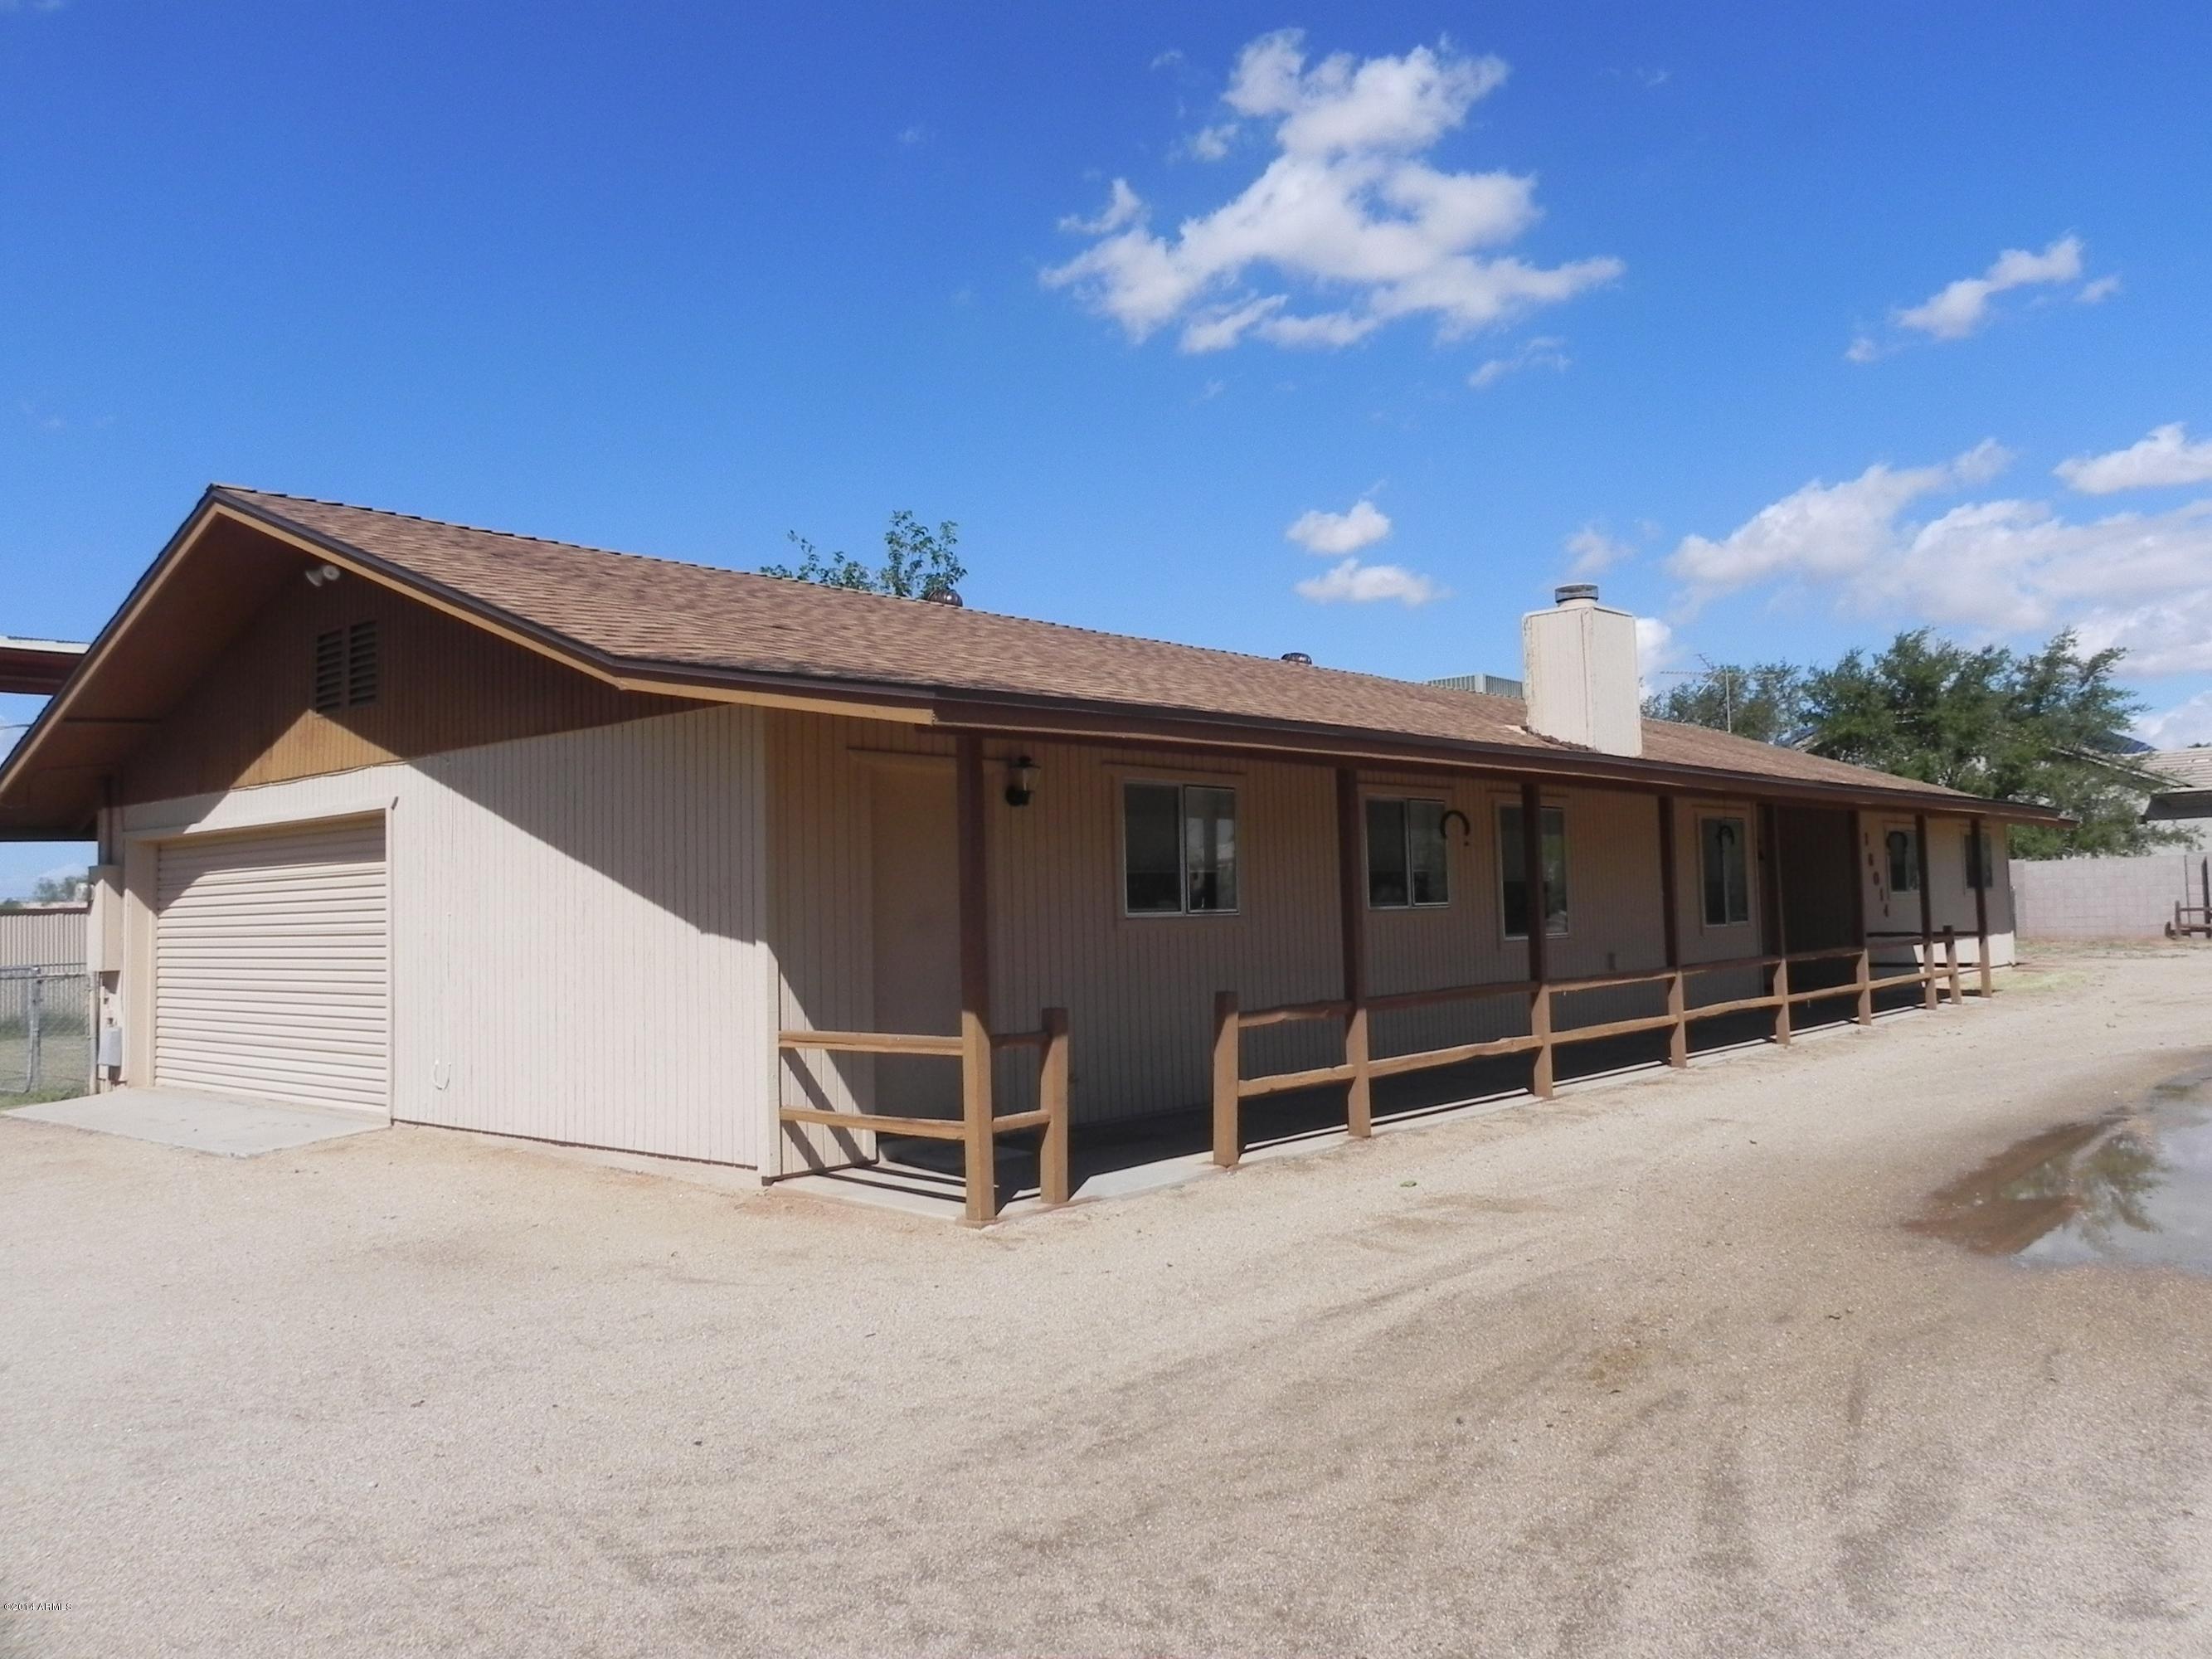 MLS 6012538 16014 N 41ST Place, Phoenix, AZ 85032 Equestrian Homes in Phoenix